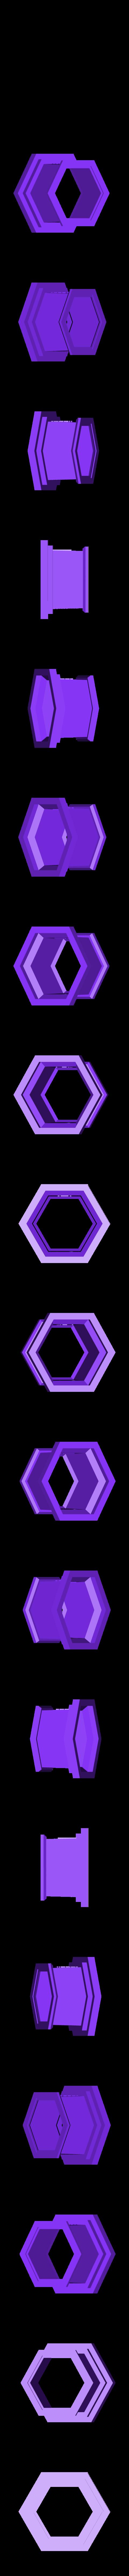 LH_hexa_base.stl Download free STL file Hexagonal Base Lighthouse Model • 3D printable model, Ogubal3D